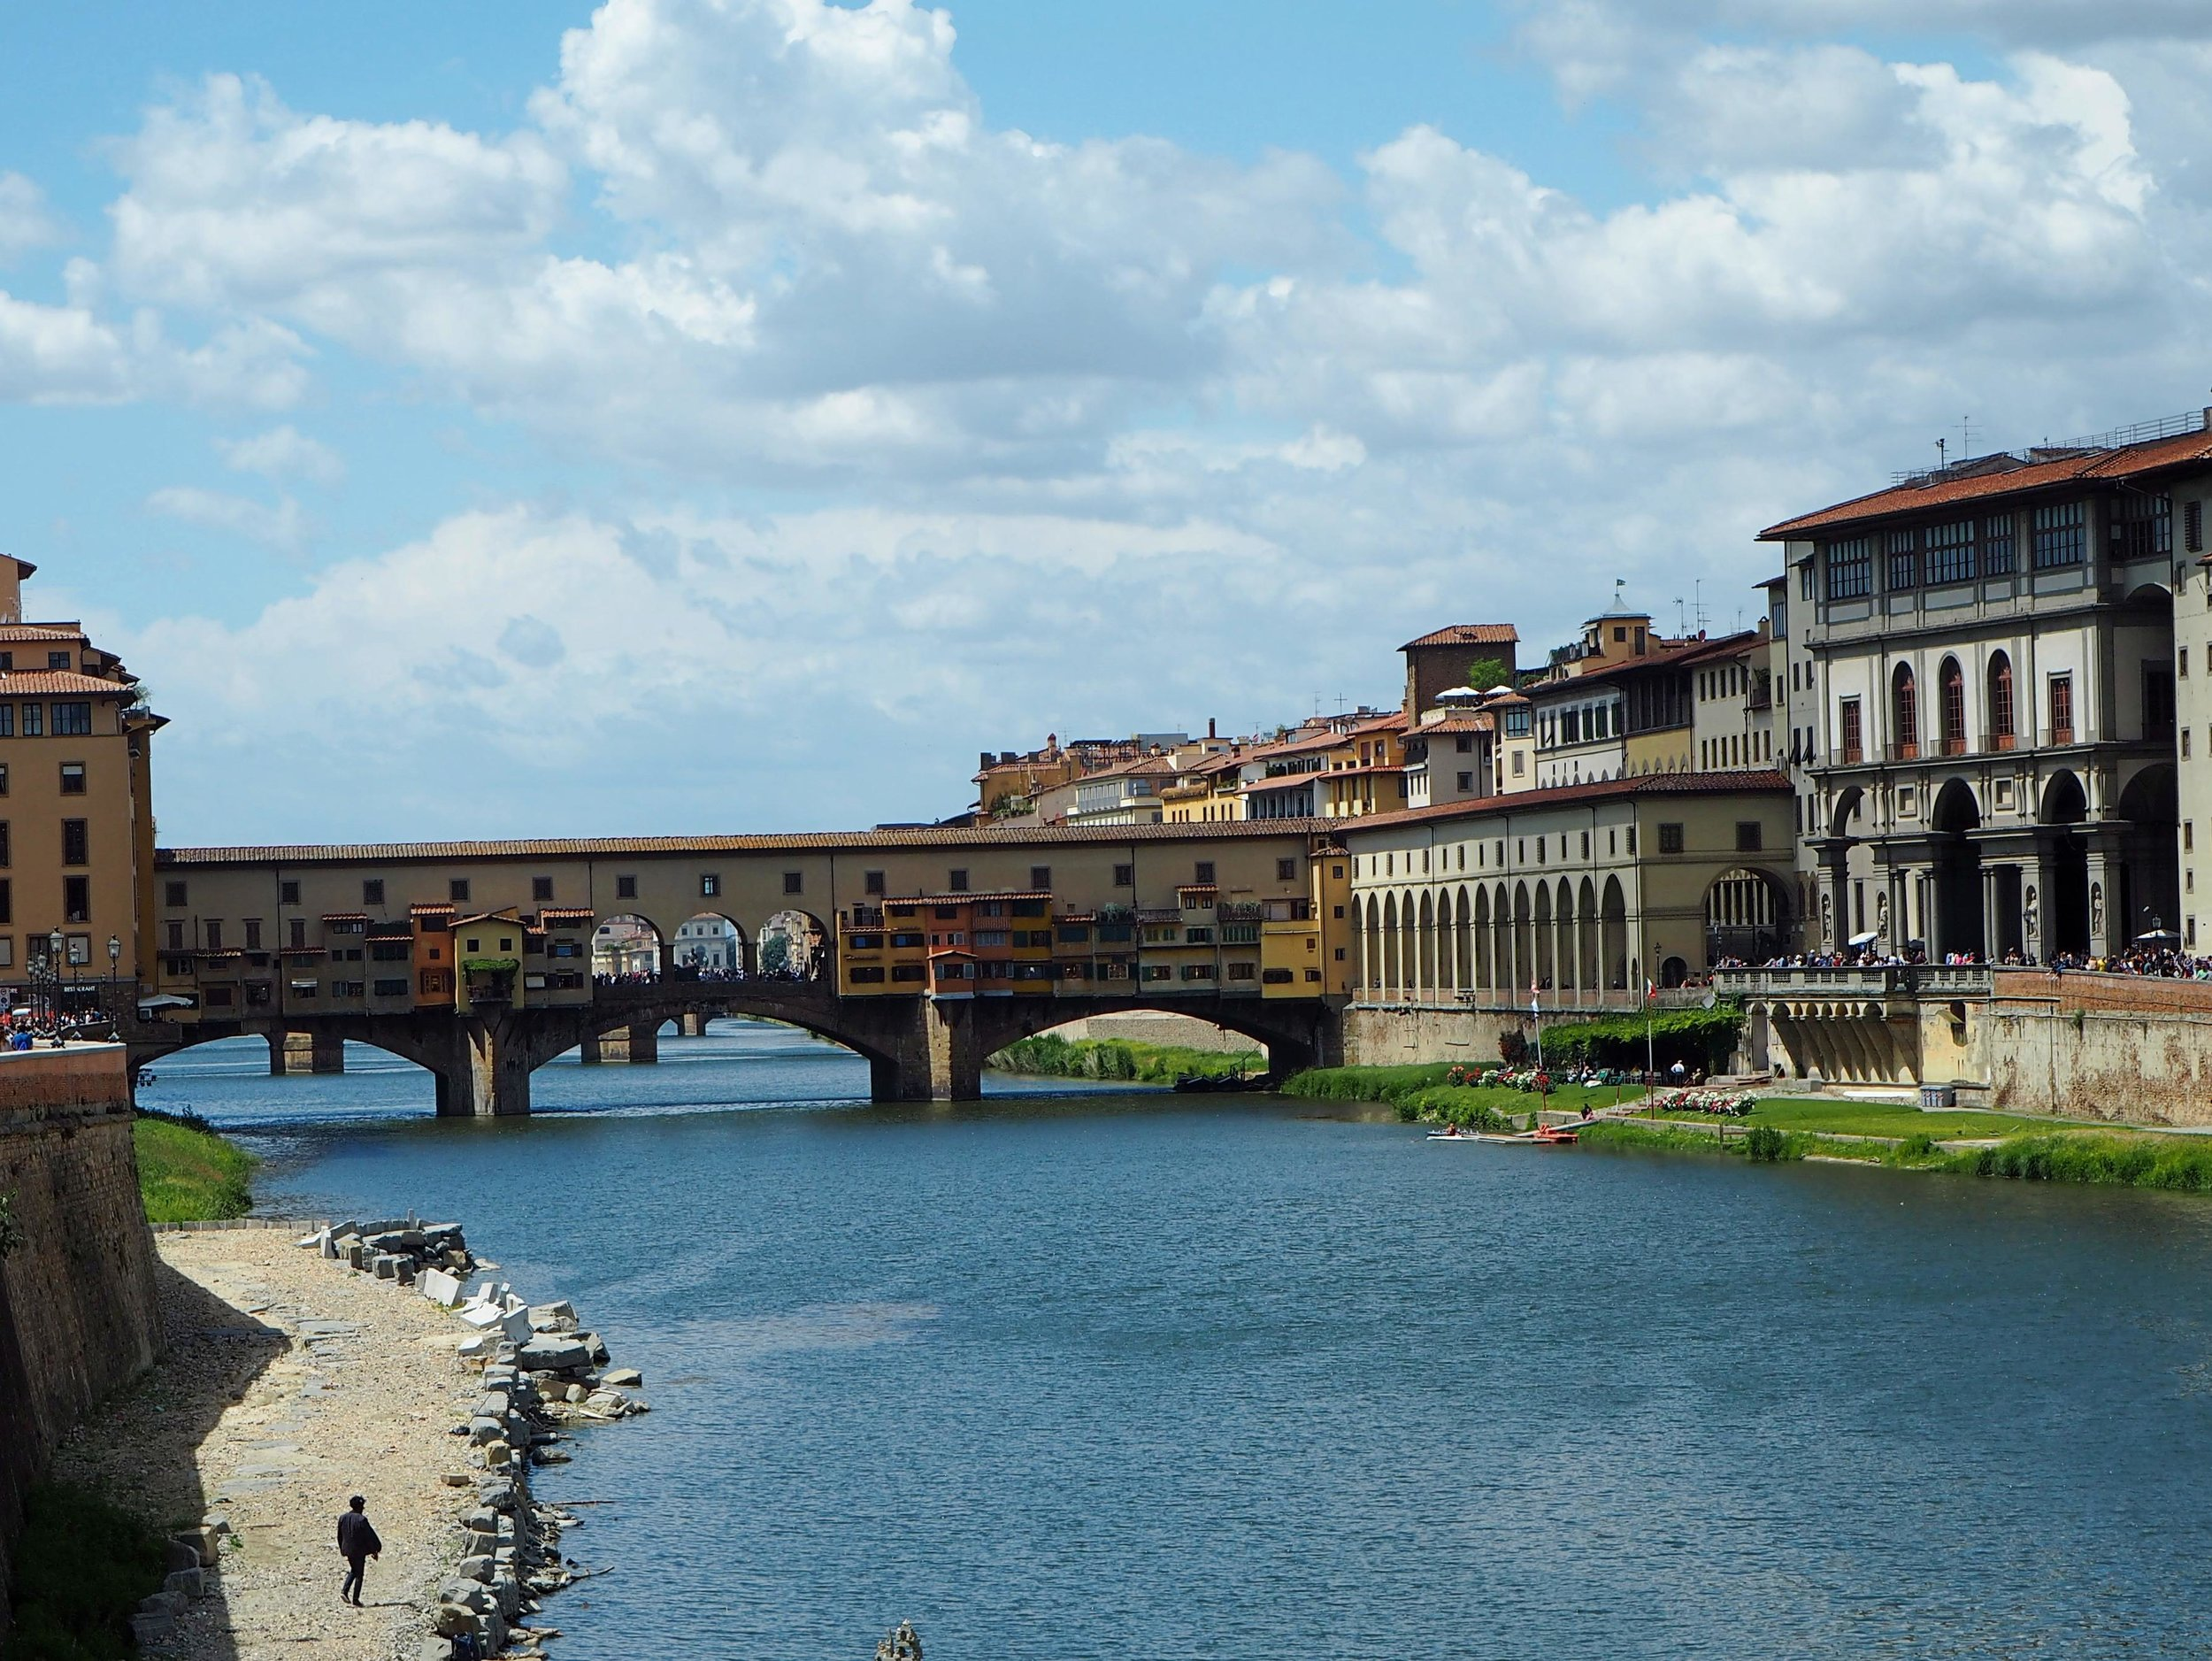 The Arno in Florence,  Ponte Vecchio